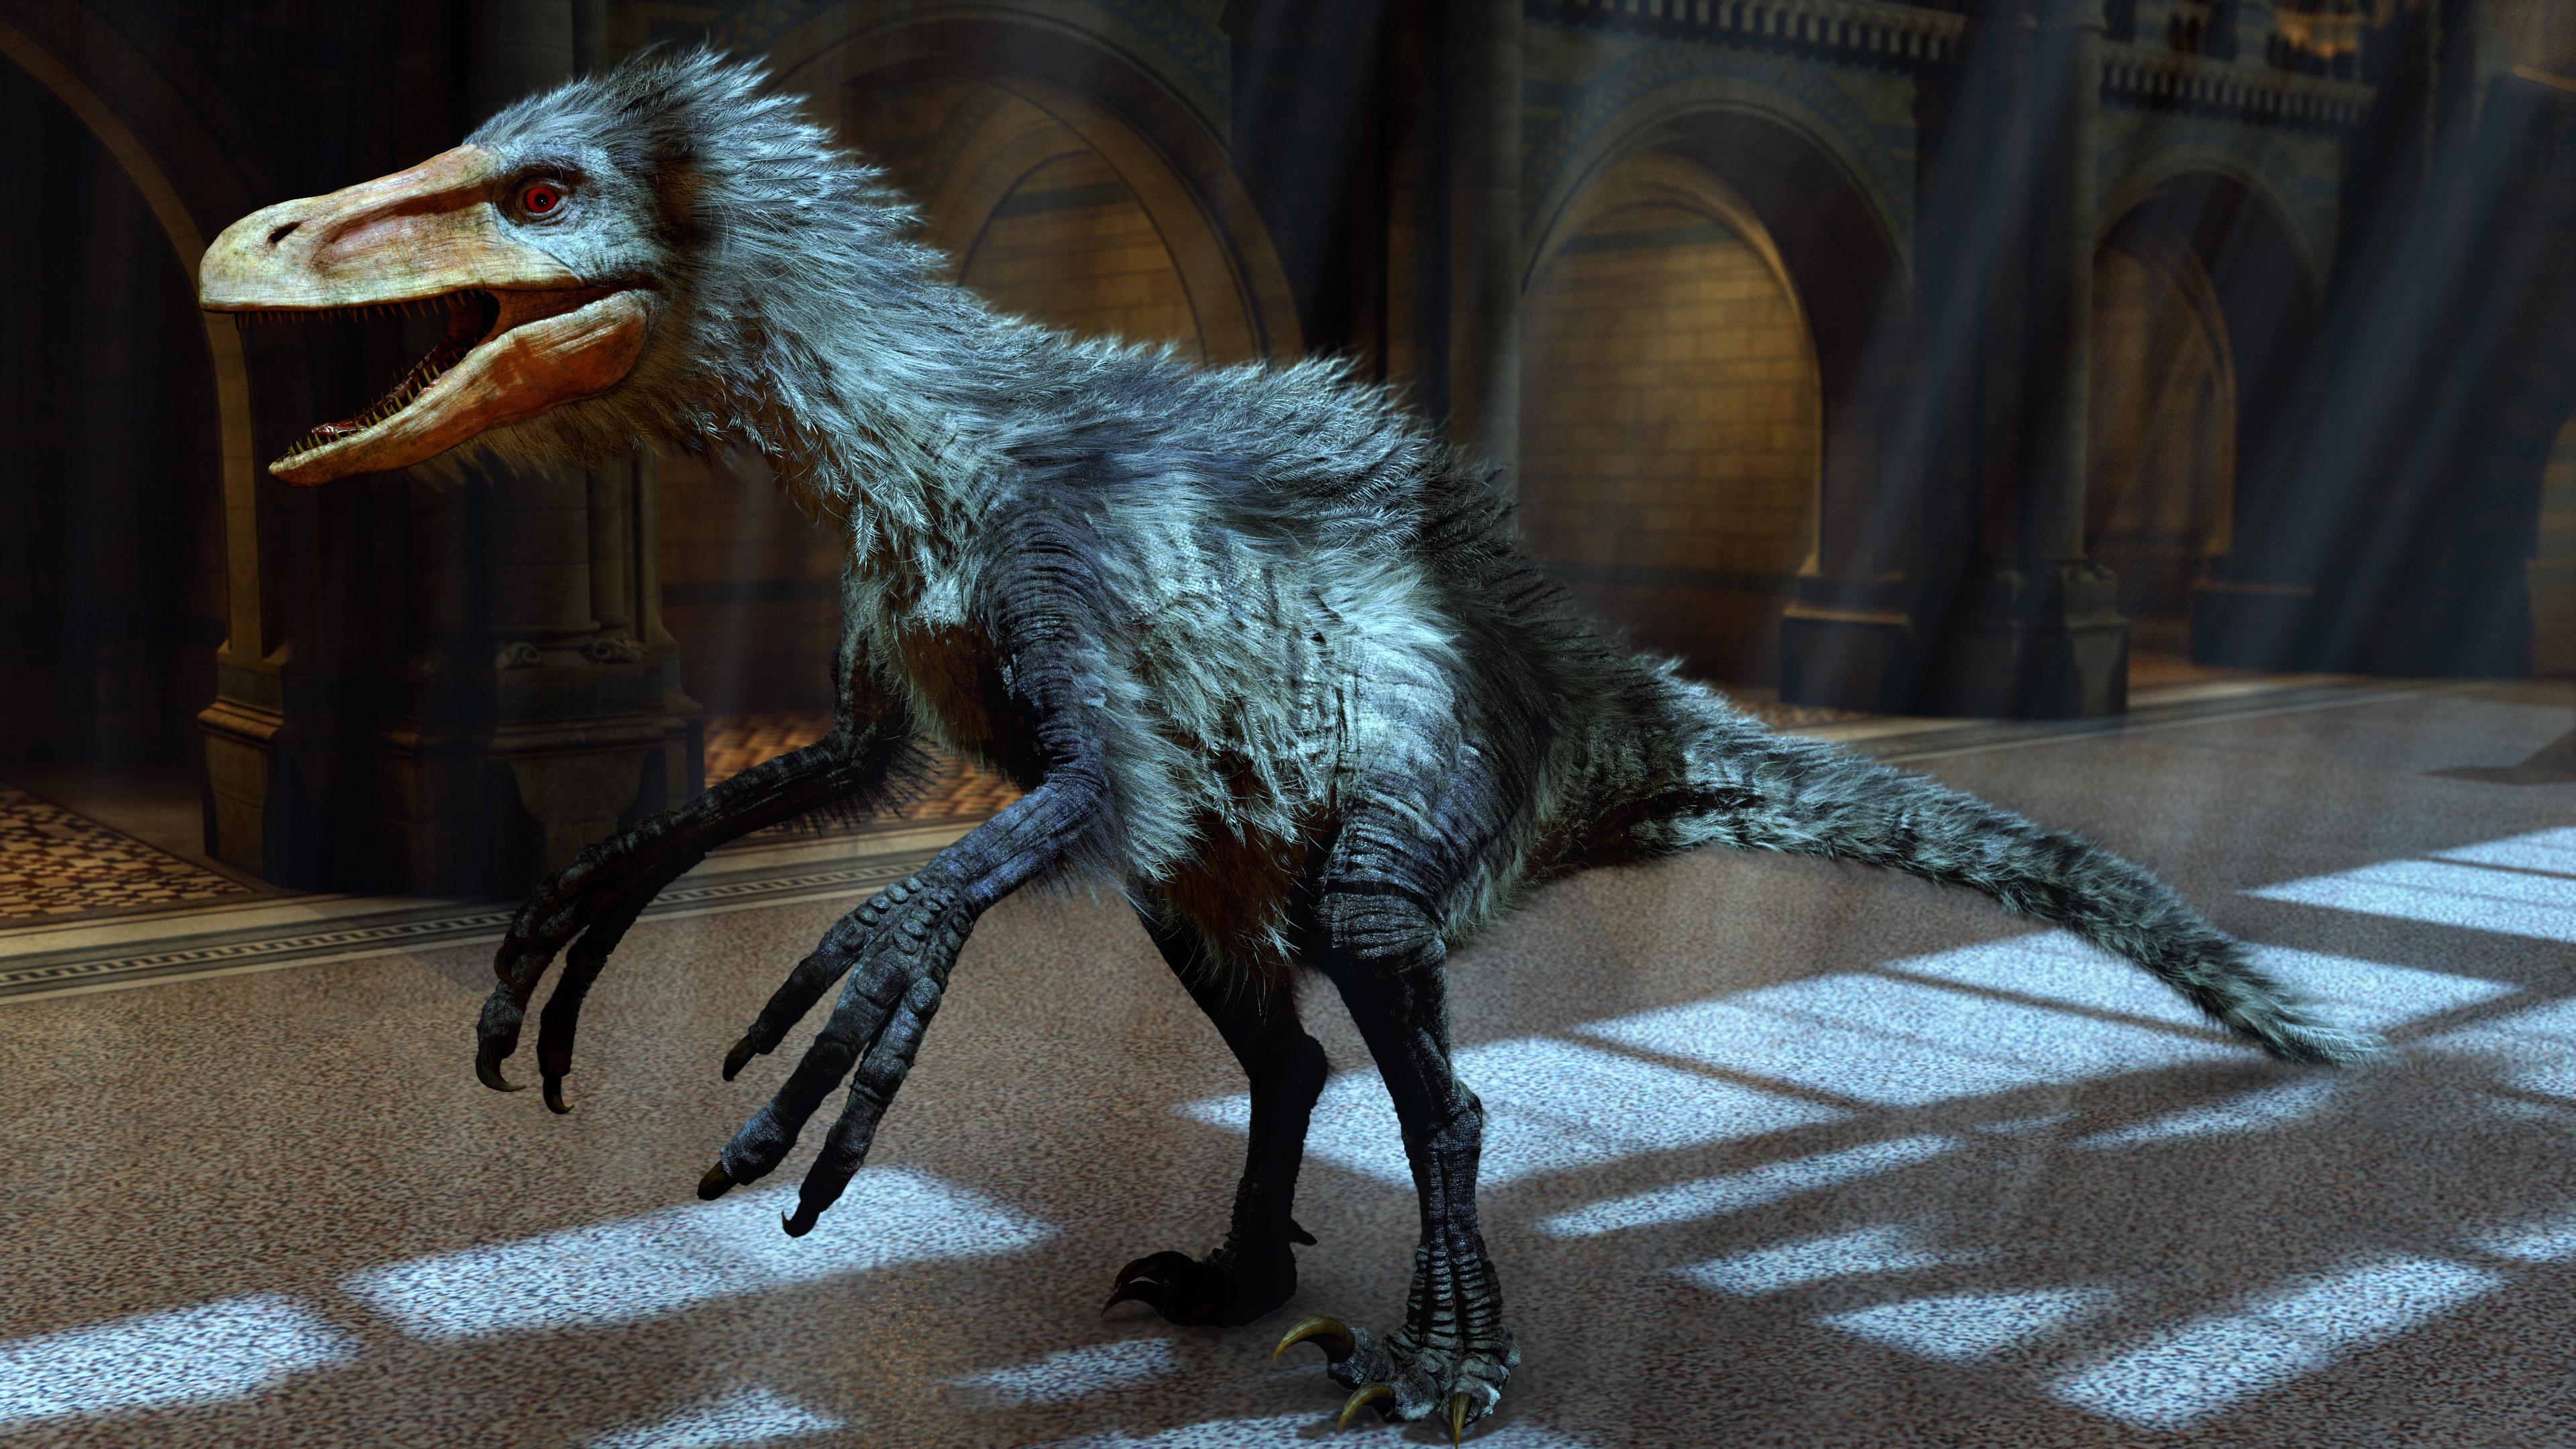 deinonychus sculpture by pheaston - photo #9